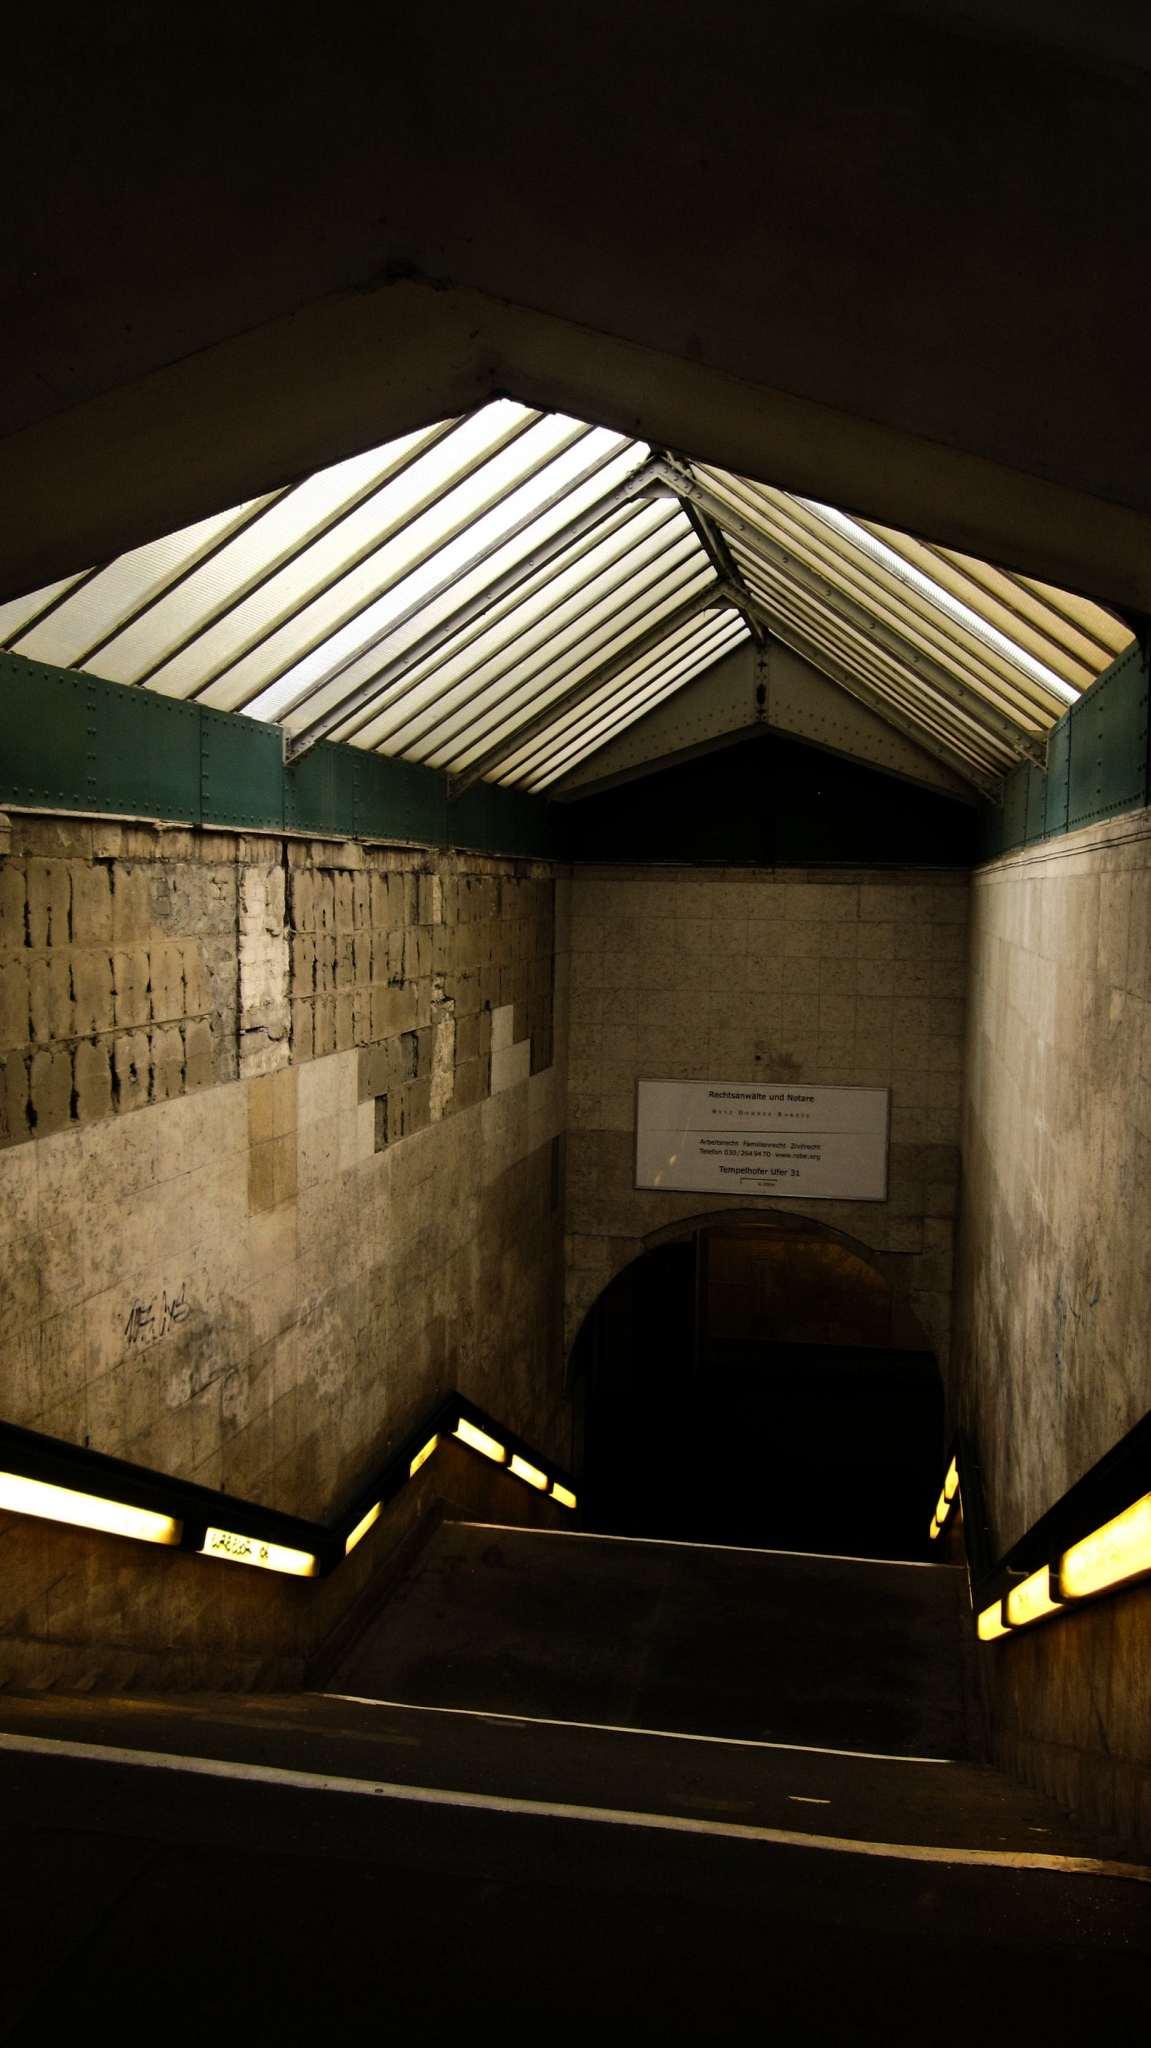 Spooky stairwell